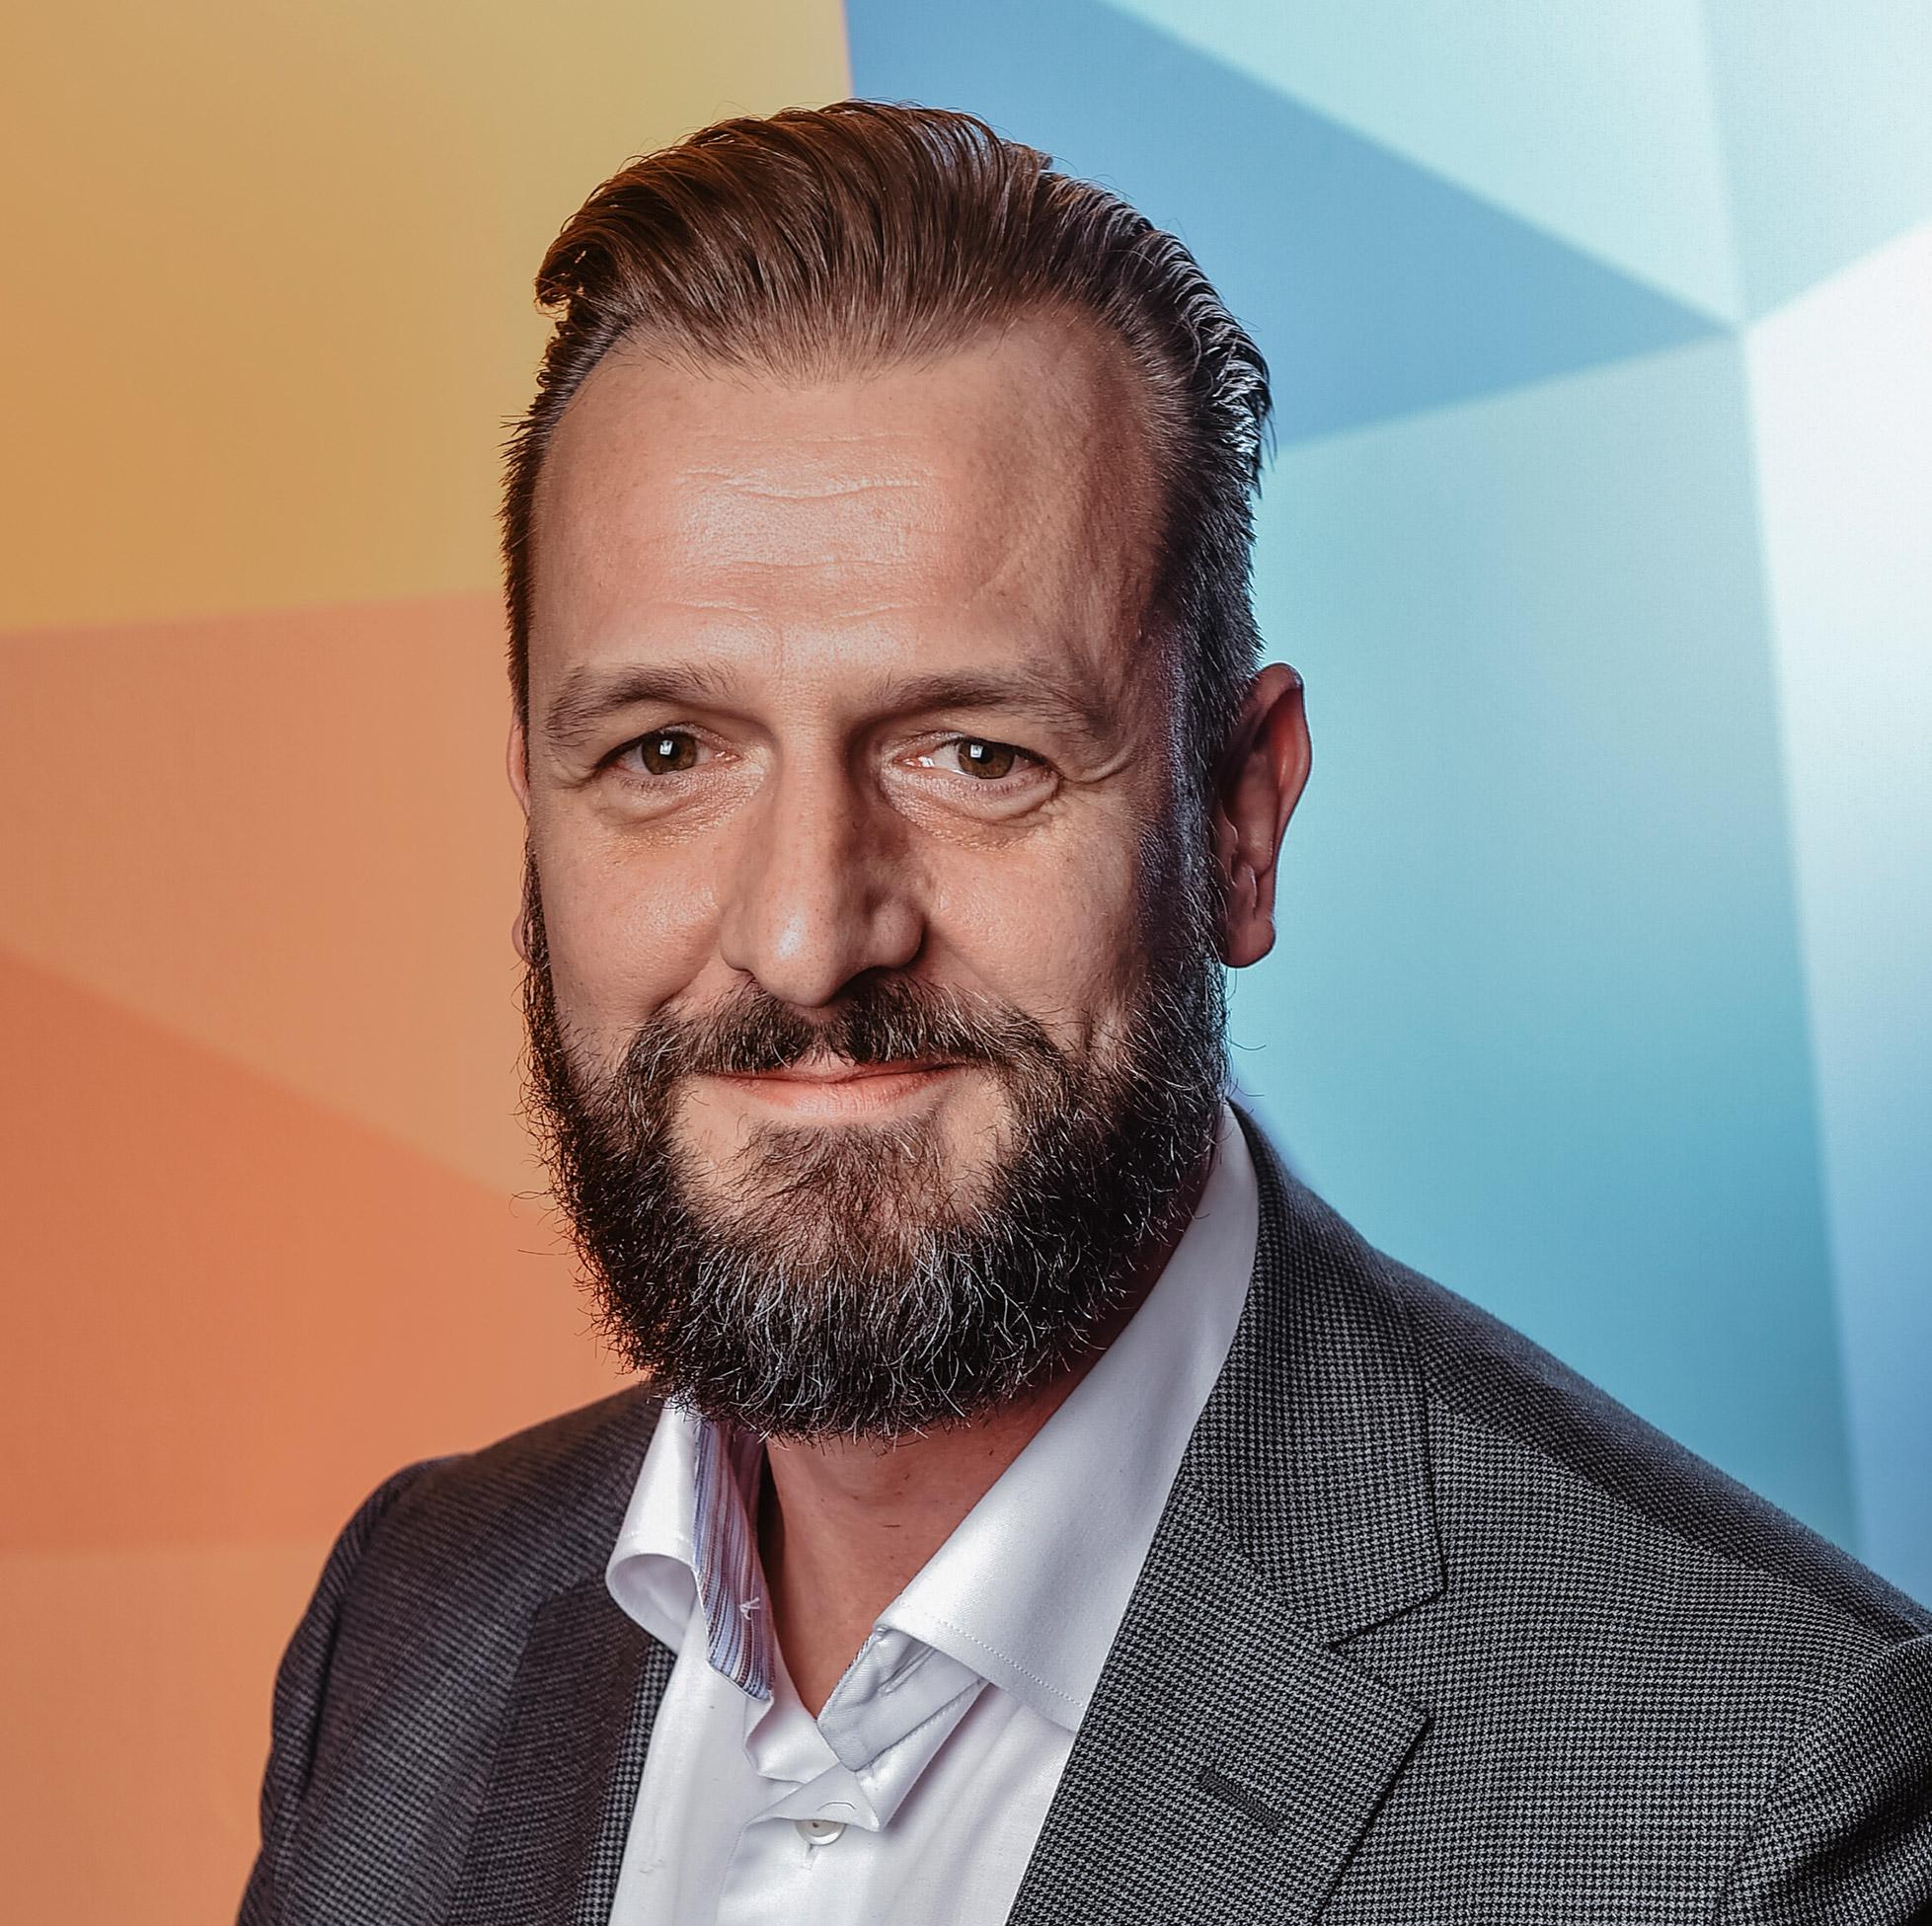 Johan Neskens